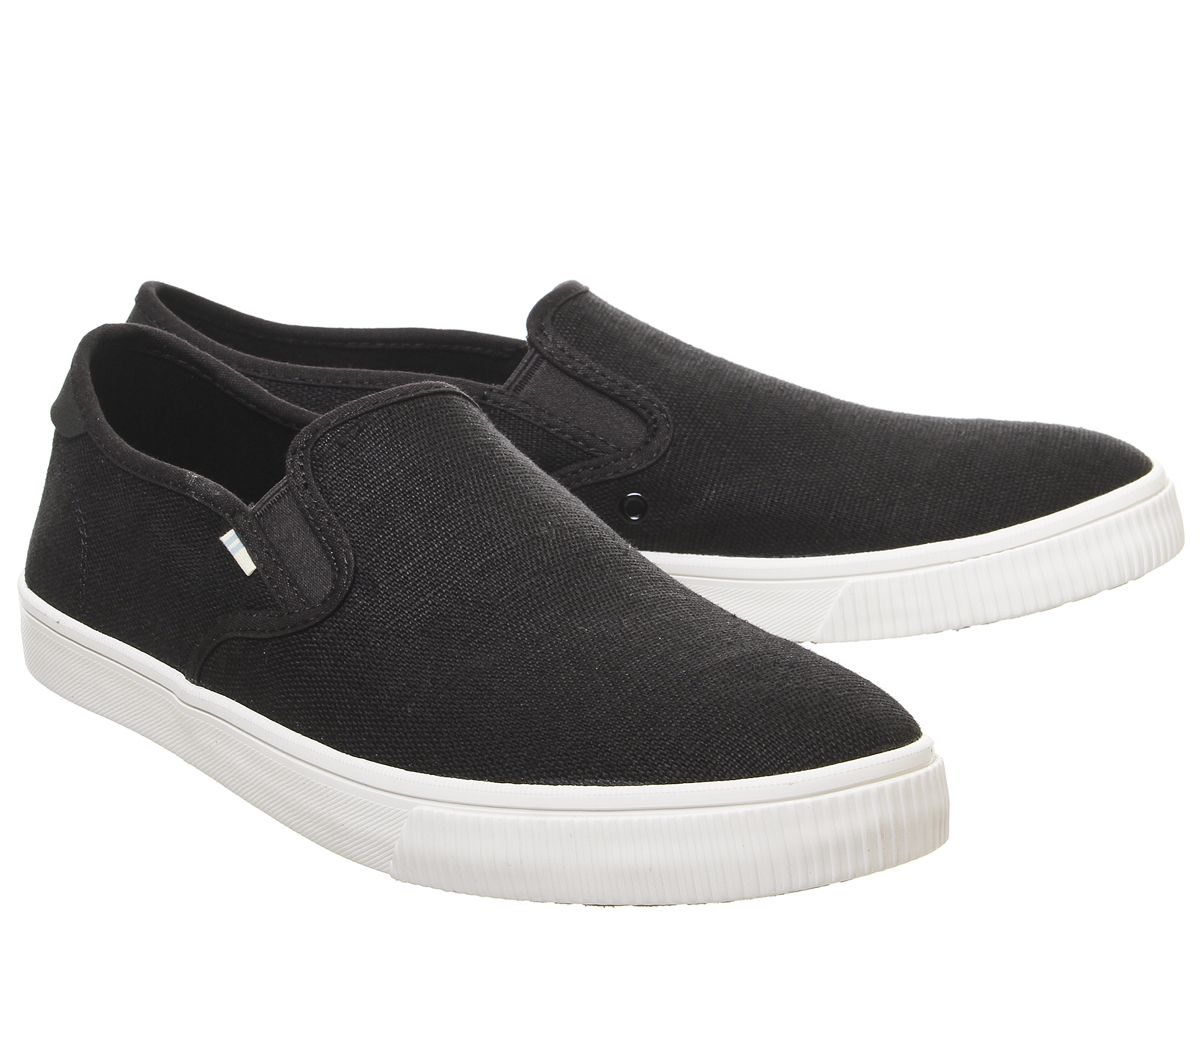 Da-Uomo-Toms-Baja-SLIP-ONS-Black-suola-bianca-scarpe-casual miniatura 7